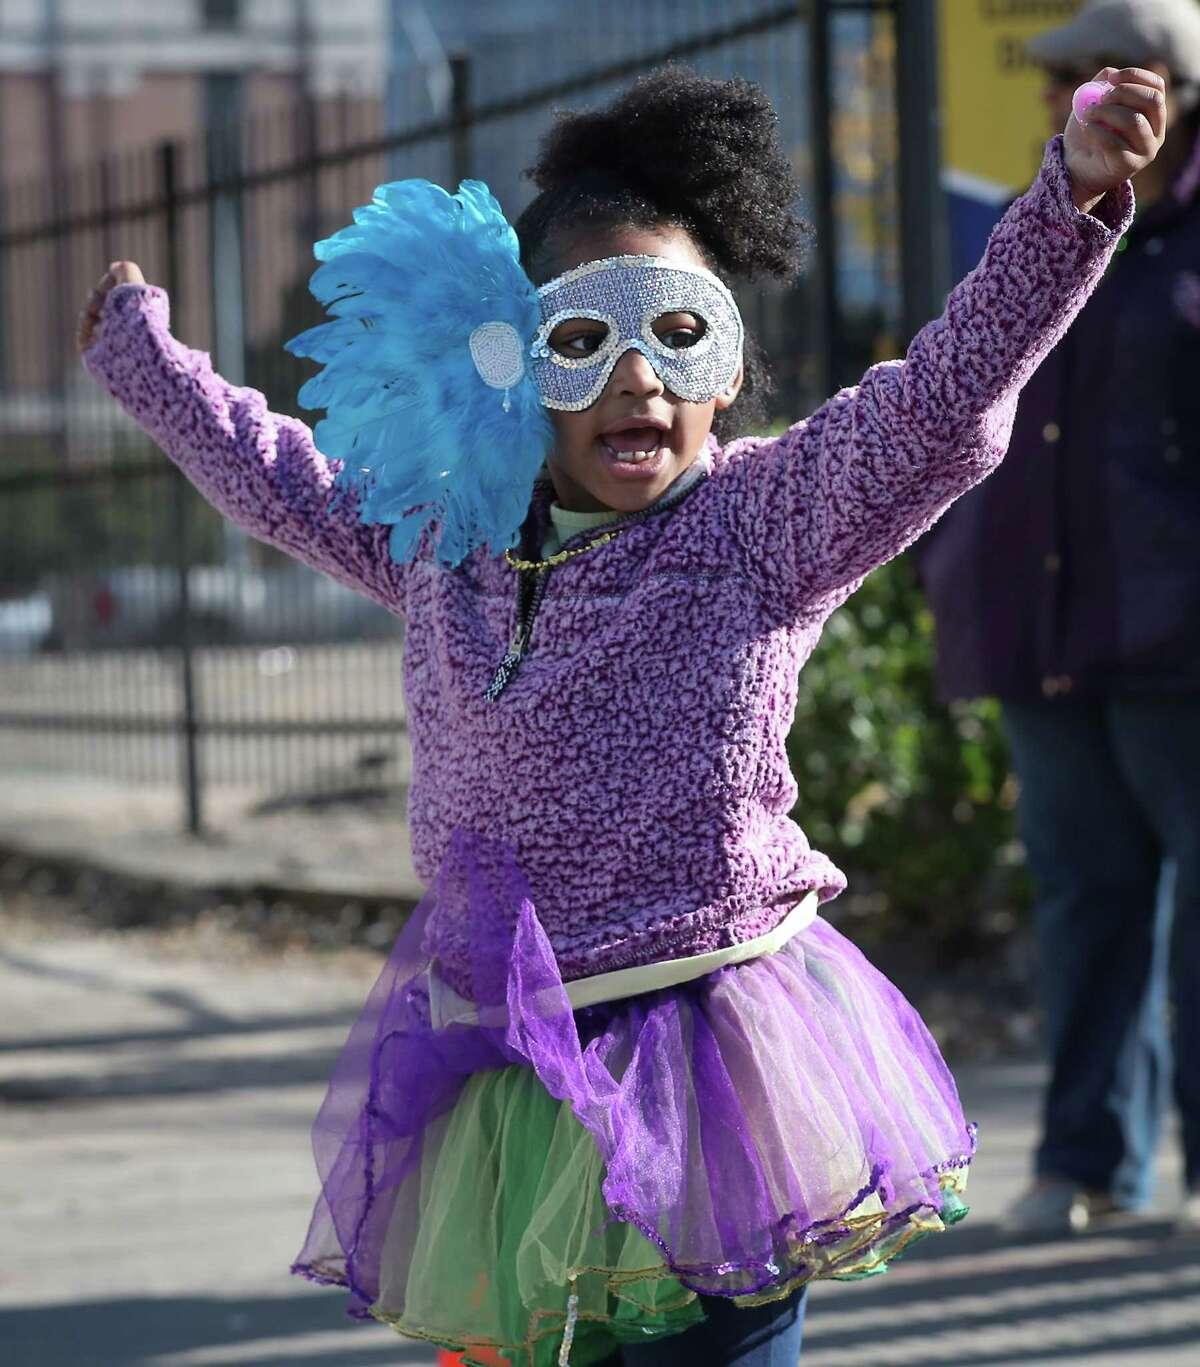 Brielle Vann, 5, enjoys the 7th Annual Houston Creole Mardi Gras Parade Saturday, Feb. 1, 2020, in Houston.